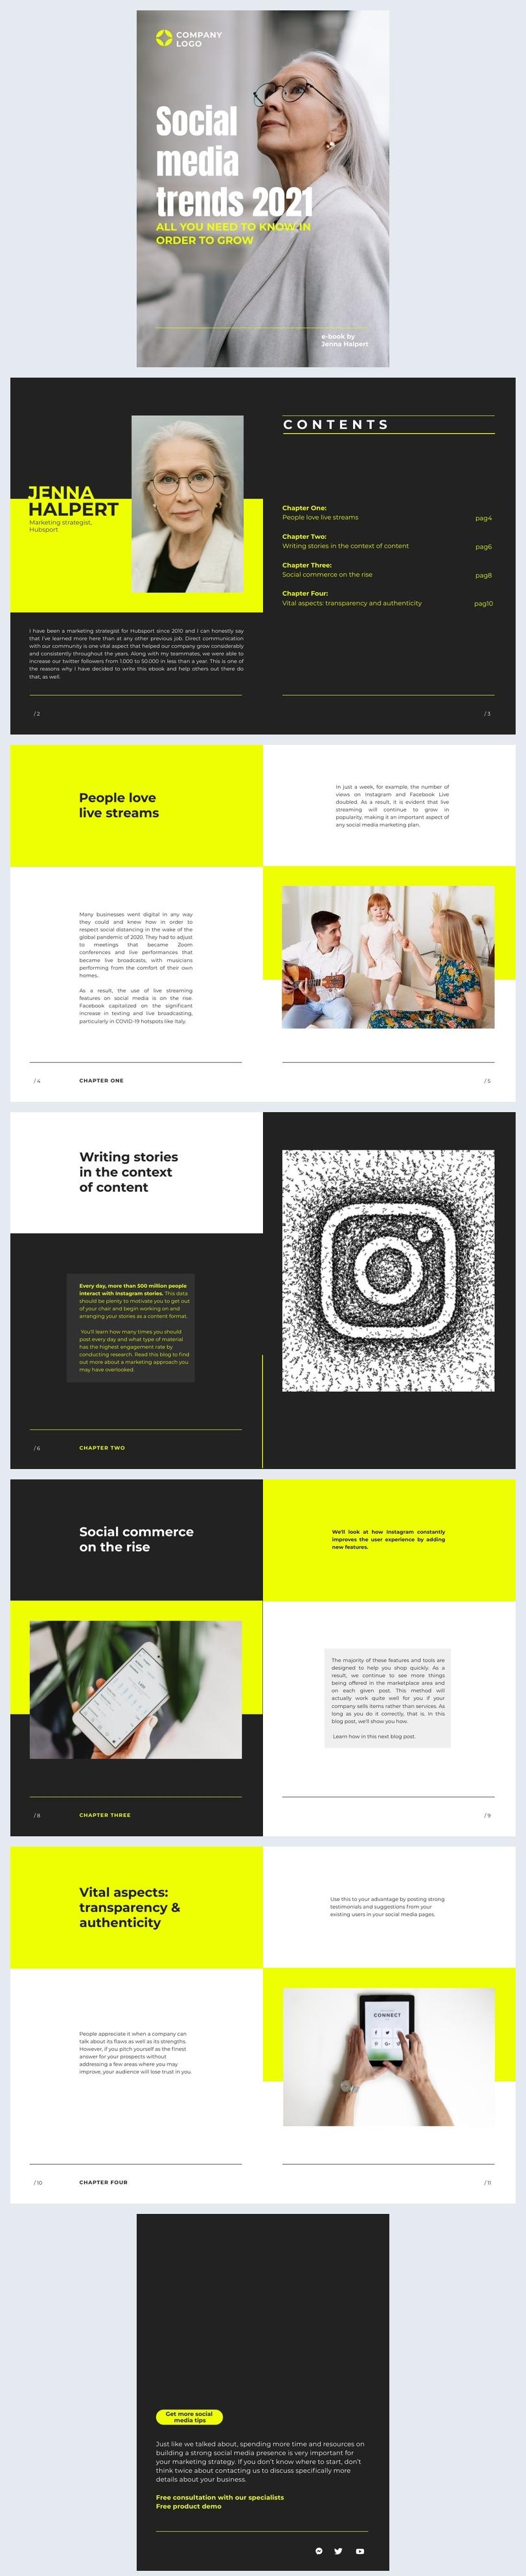 Social Media Marketing eBook Design Example